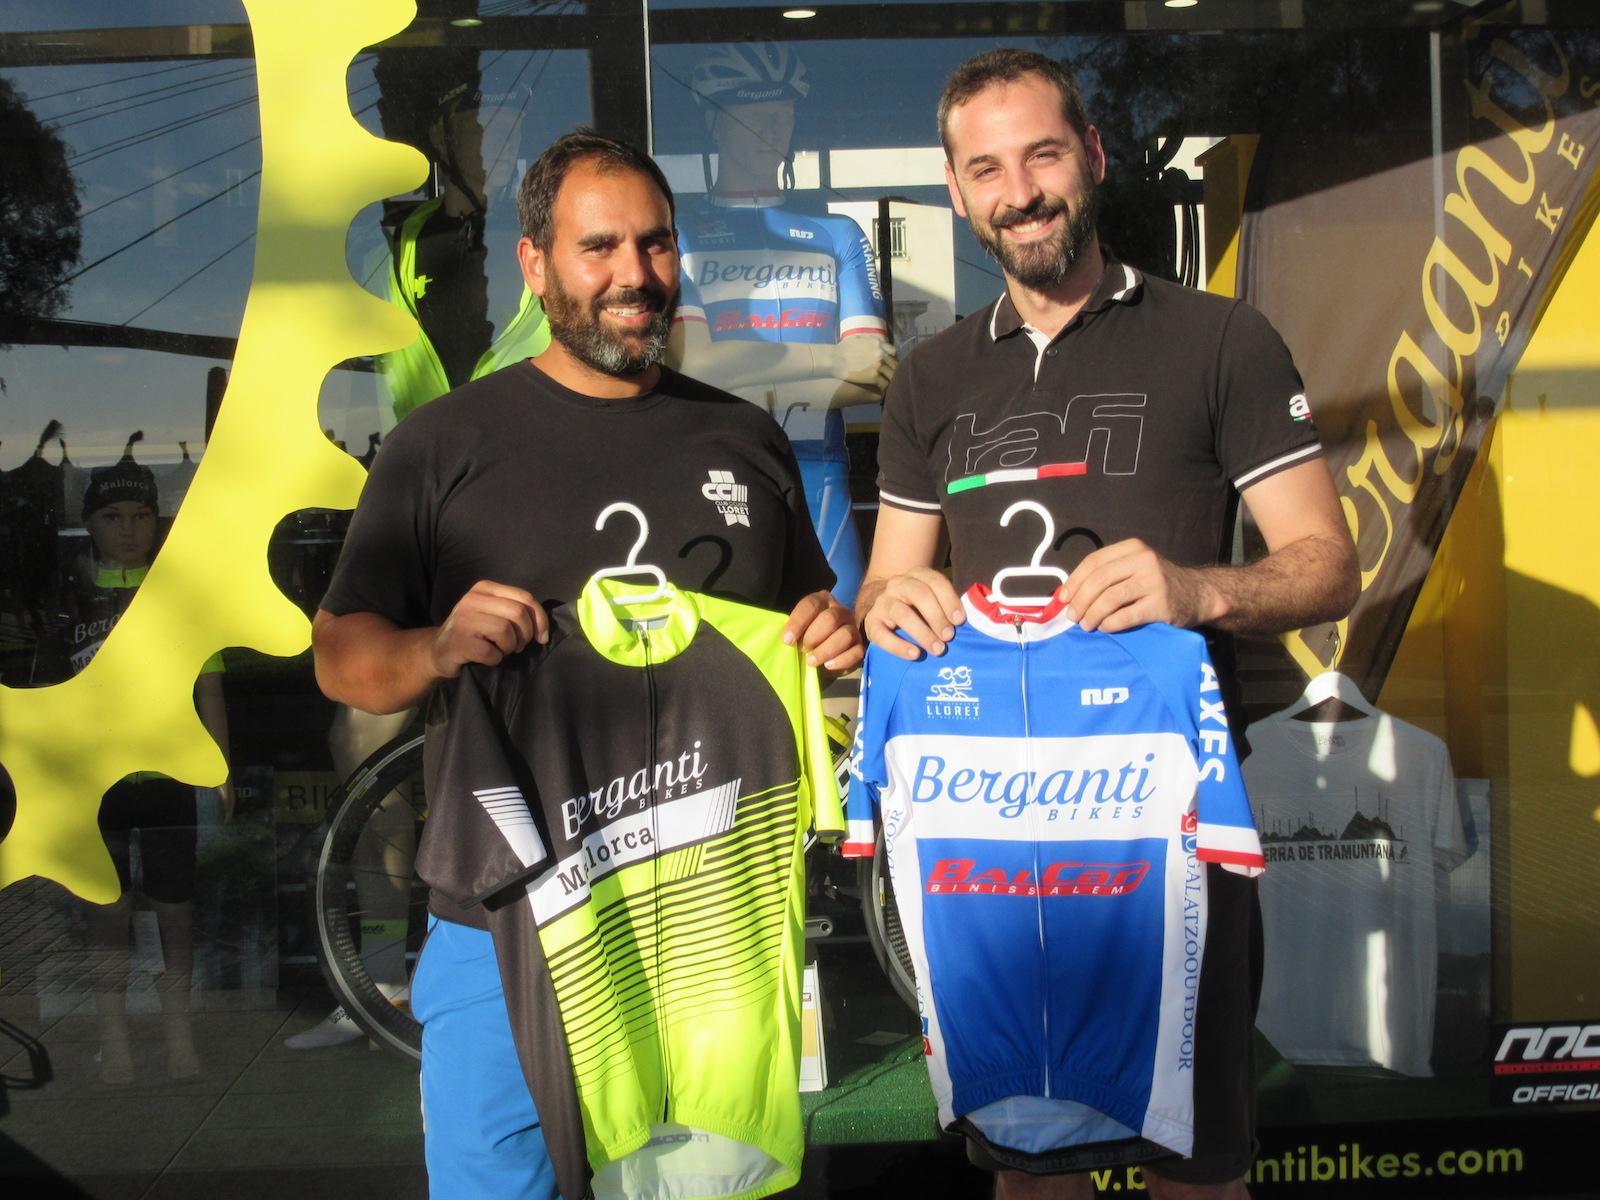 berganti_bikes_patrocinador_2017